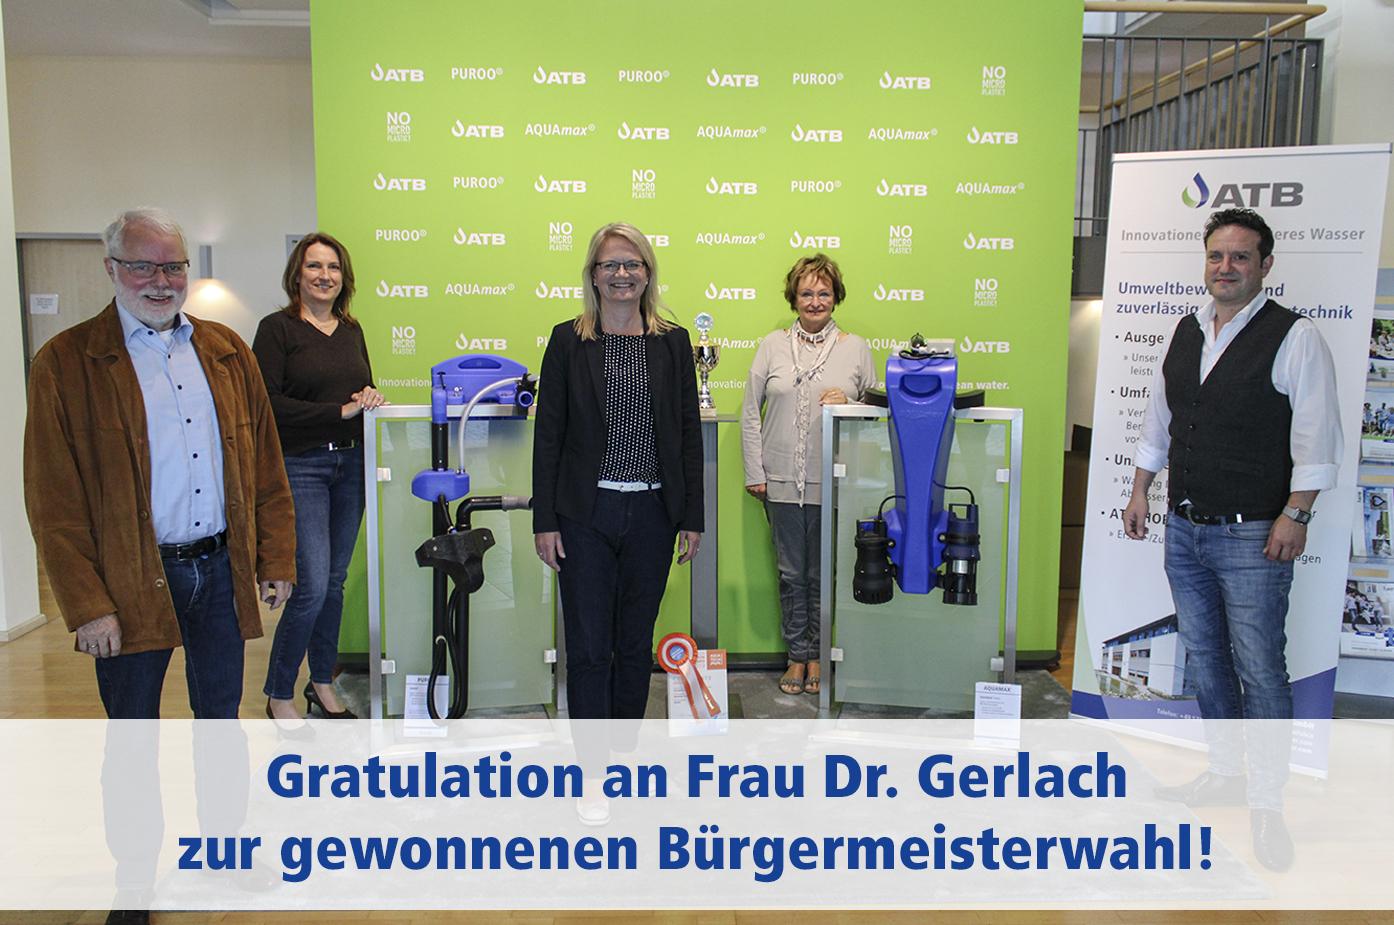 Besuch der Bürgermeisterkandidatin Sonja Gerlach bei ATB